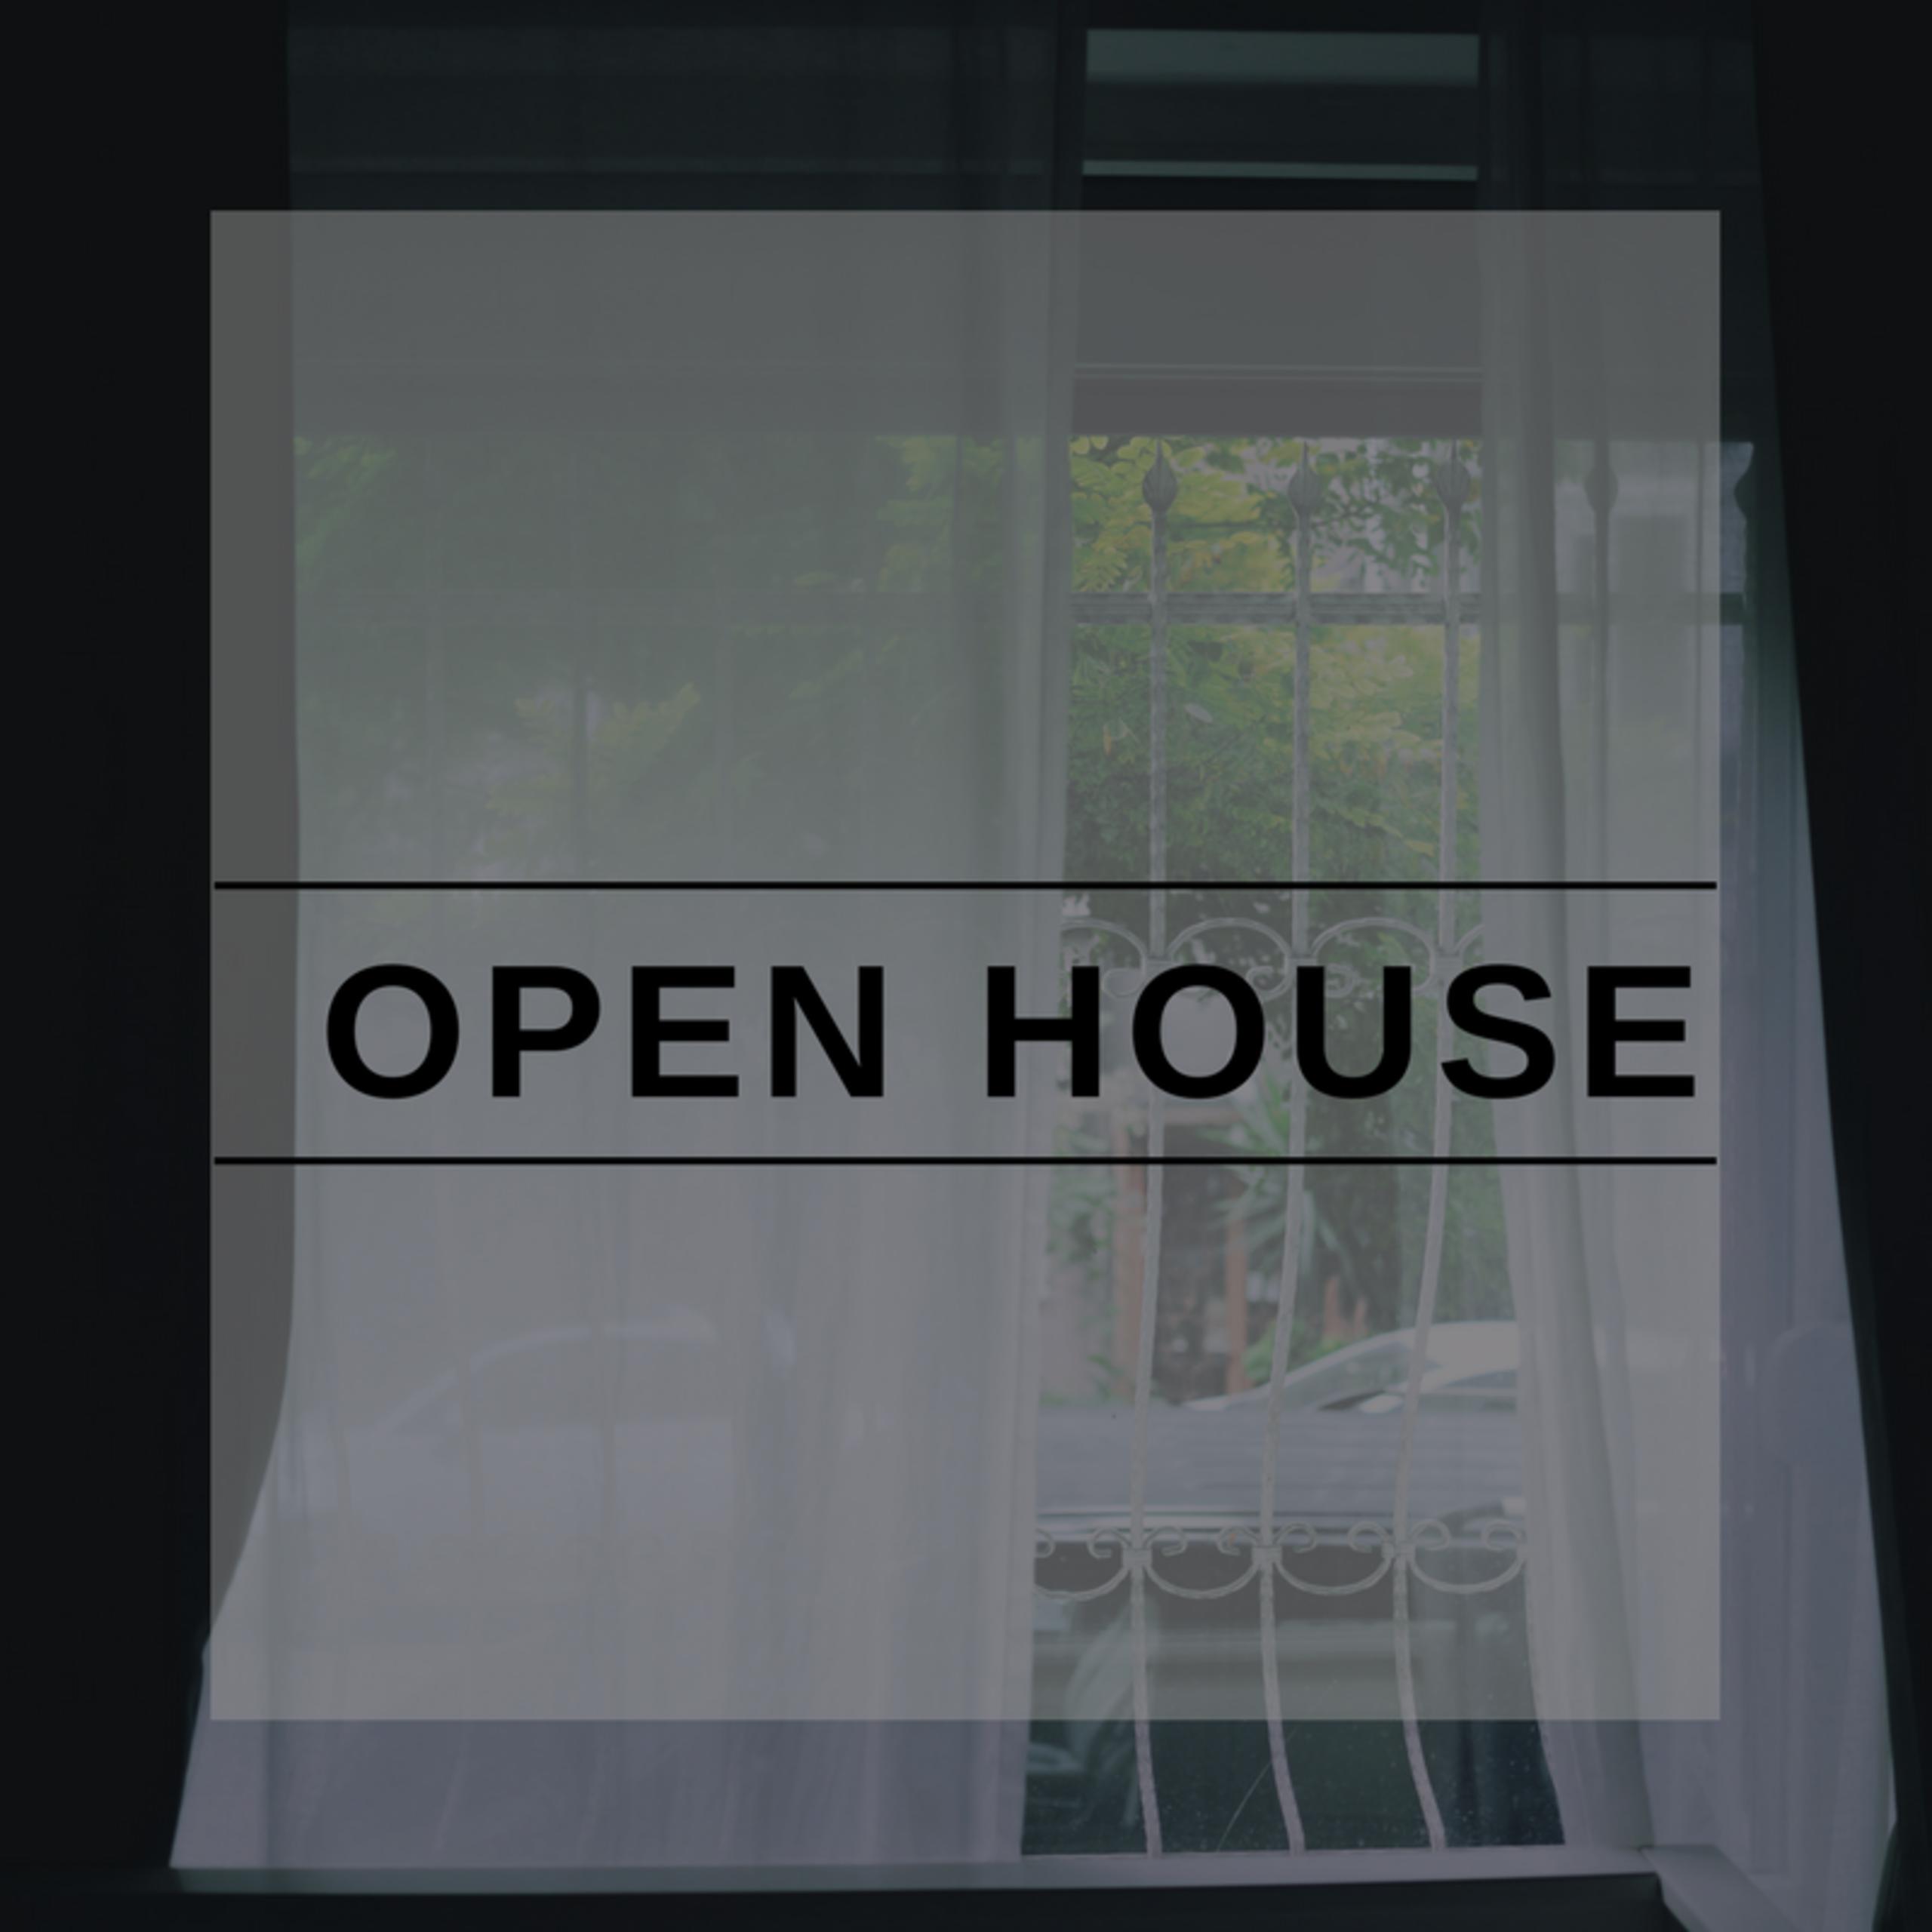 OPEN HOUSE LIST 2/24 – 2/25